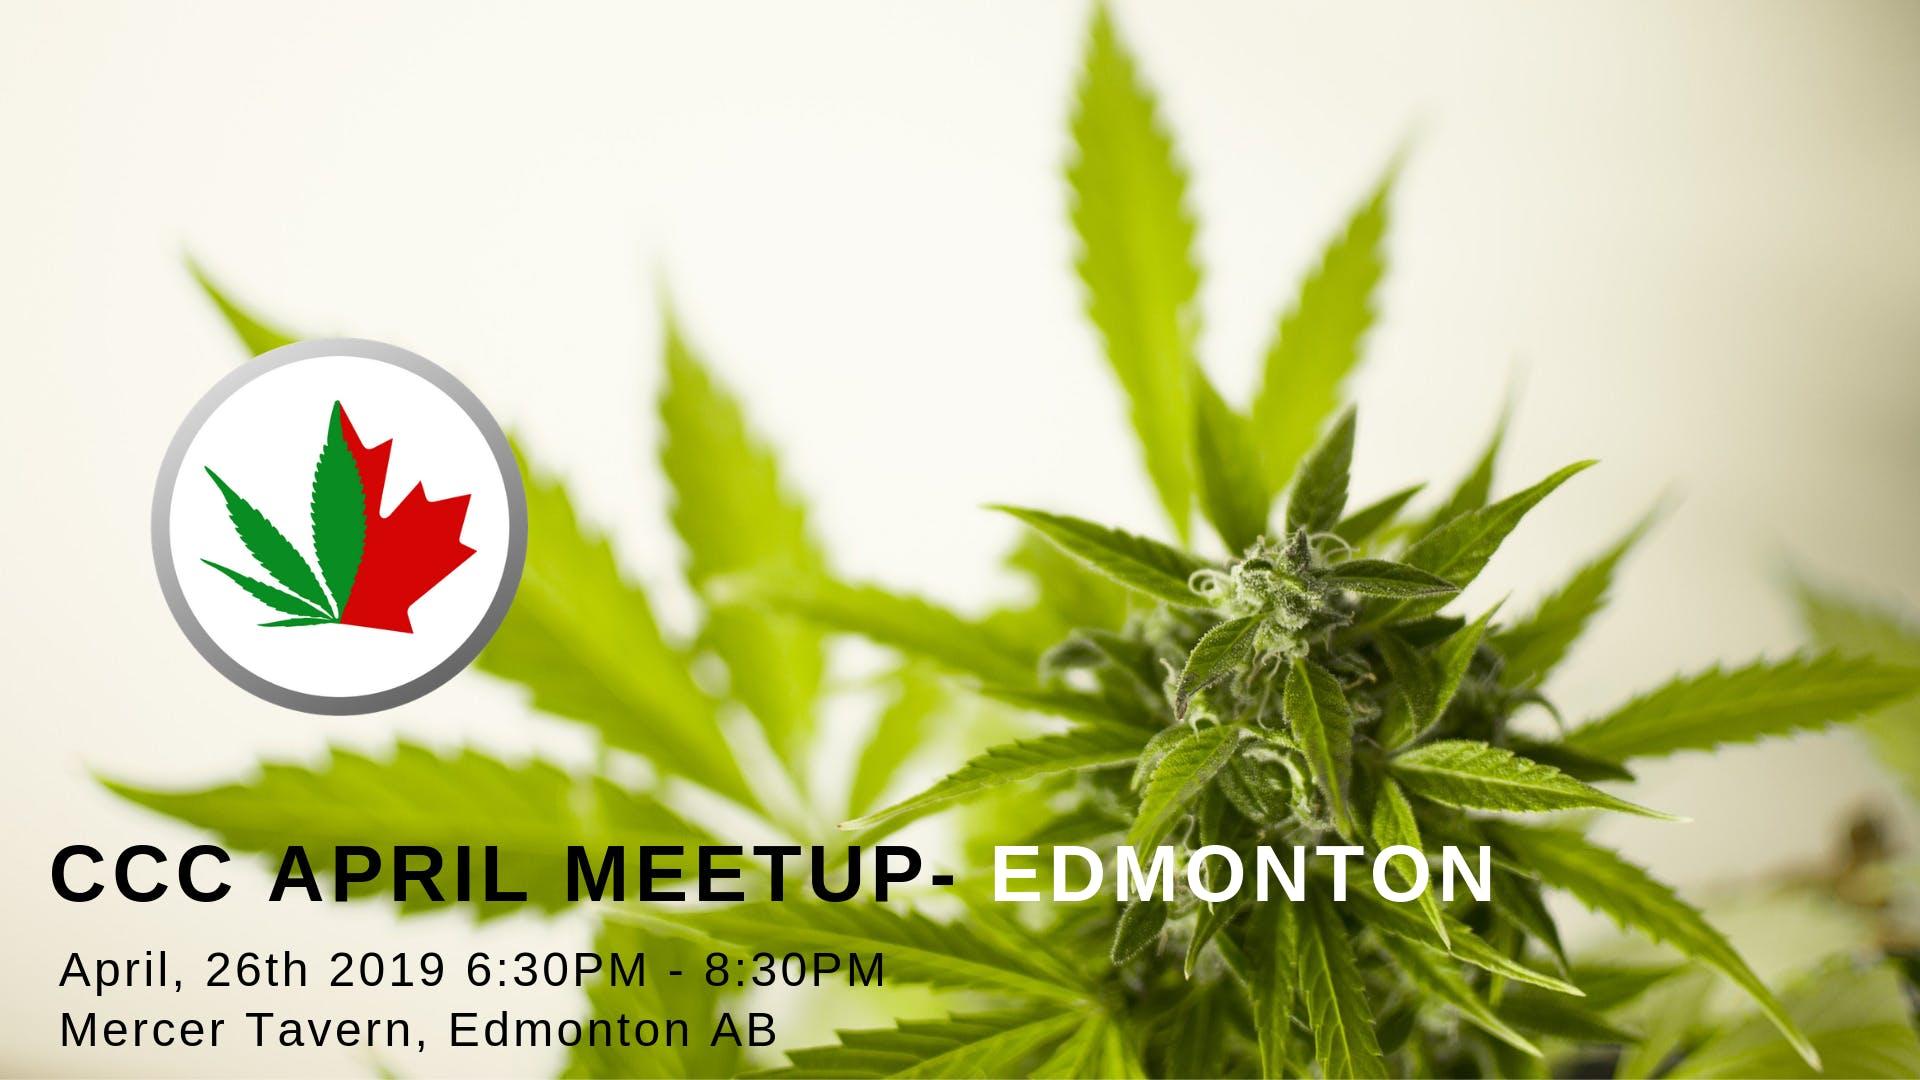 CCC April Meetup - Edmonton